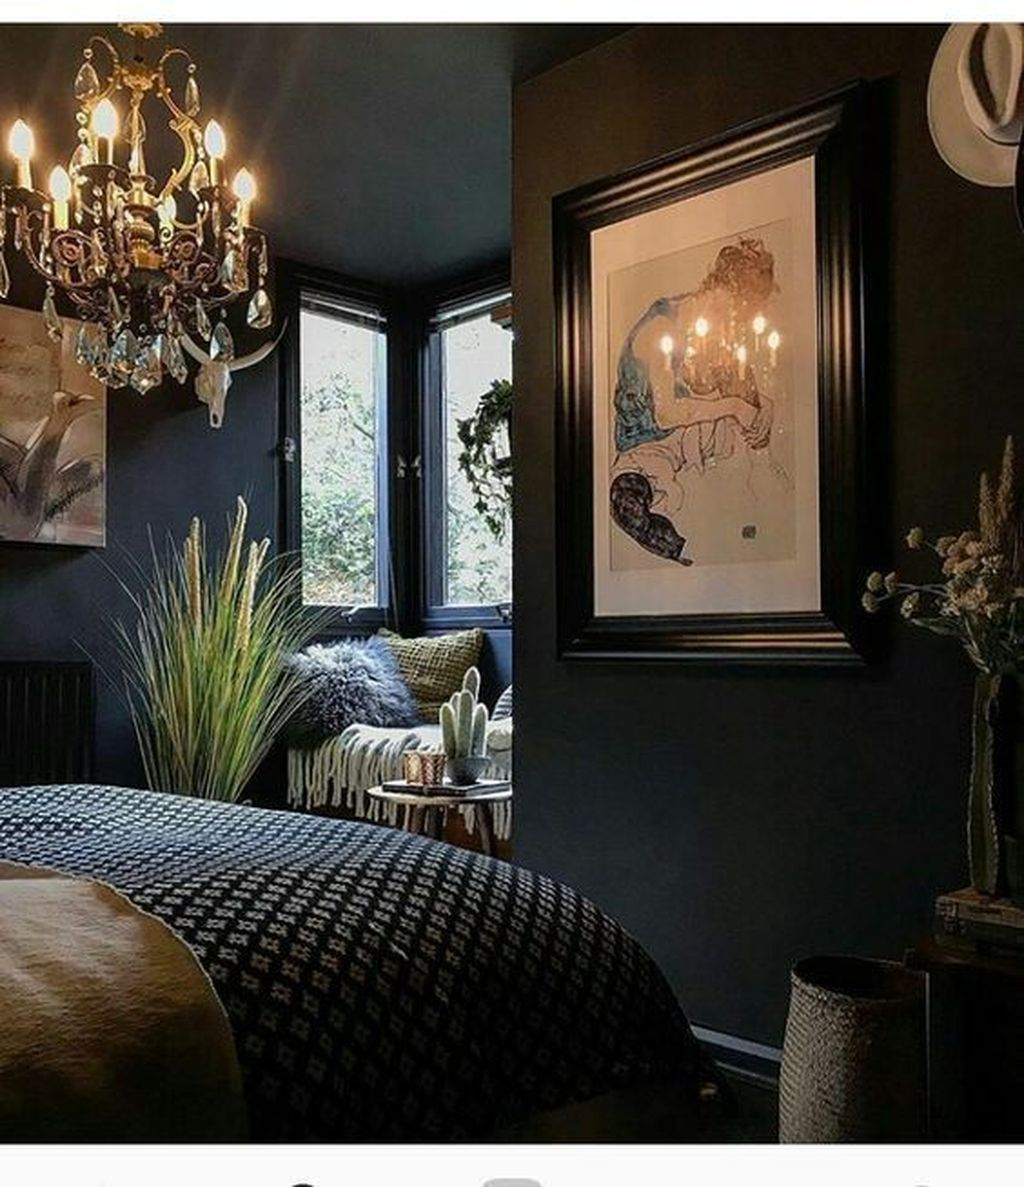 Awesome 45 Inspiring Vintage Bedroom Decorations More At Https Homishome Com 2019 01 Luxurious Bedrooms Vintage Bedroom Styles Scandinavian Design Bedroom